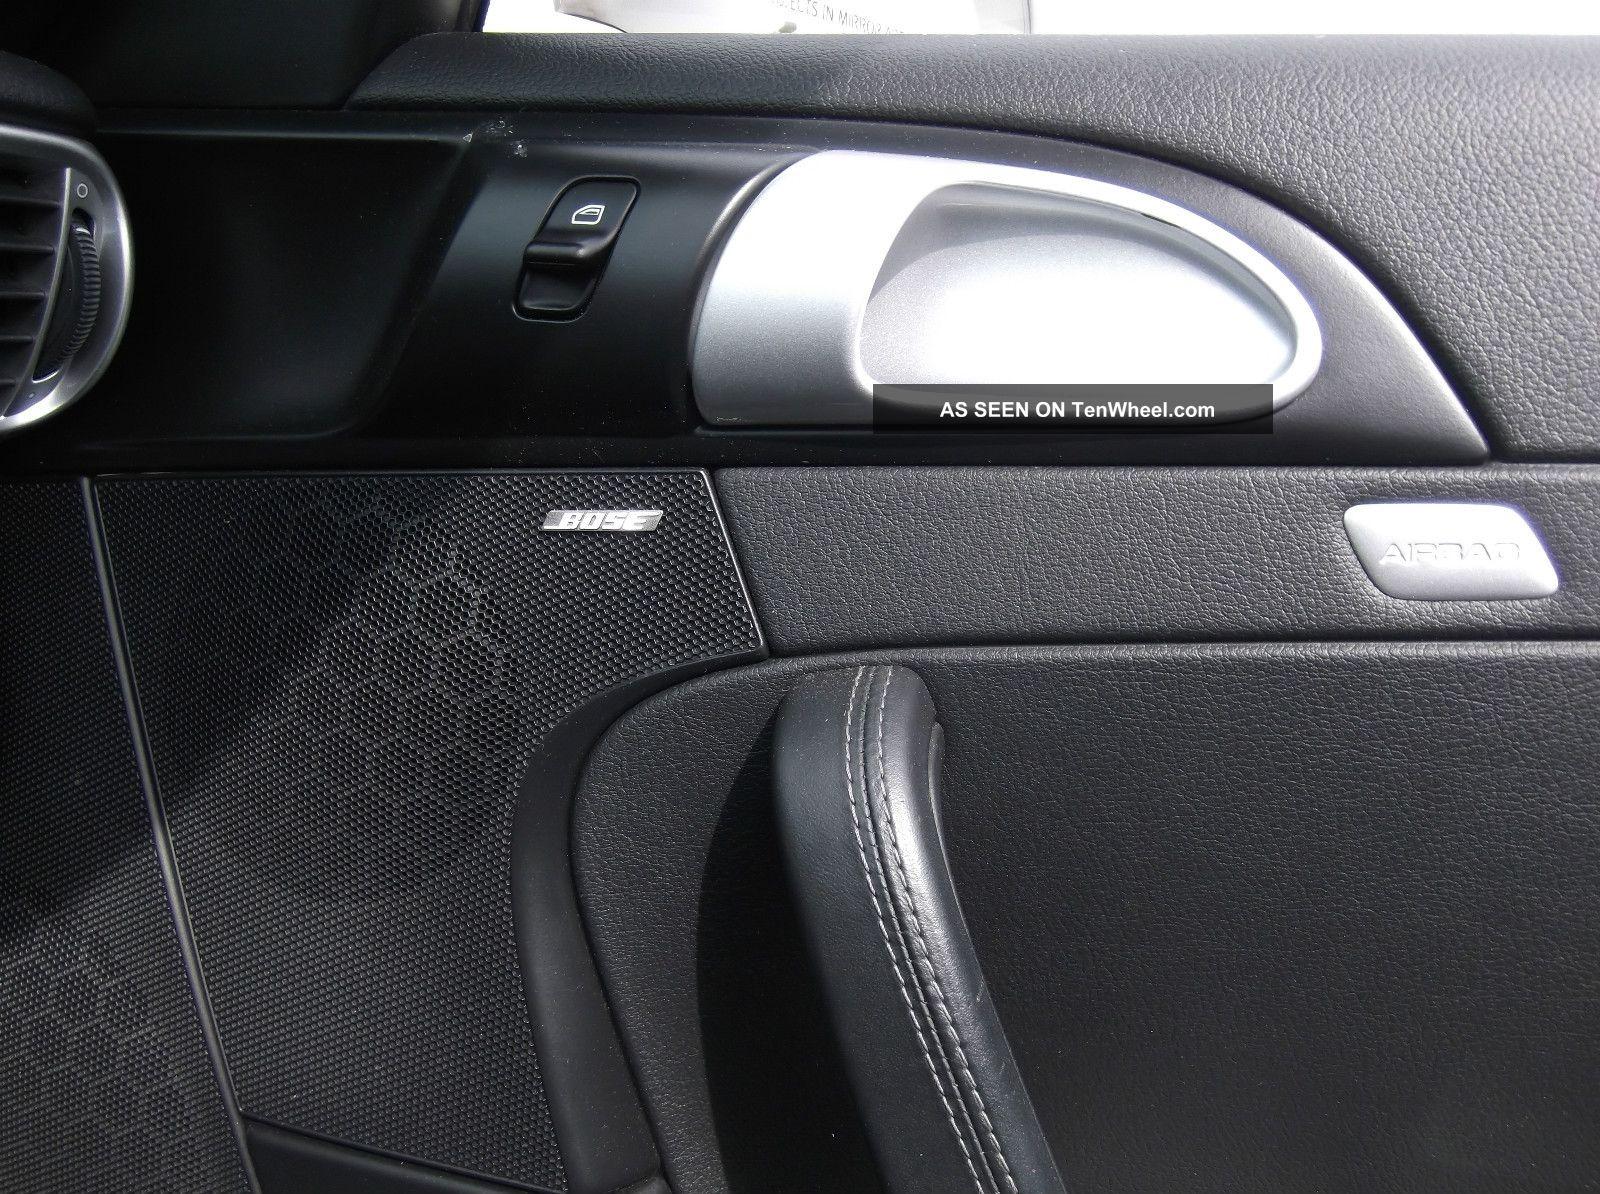 2011 porsche 911 carrera s convertible pdk 2010 mercedes e550 owners manual 2011 mercedes benz e550 owners manual